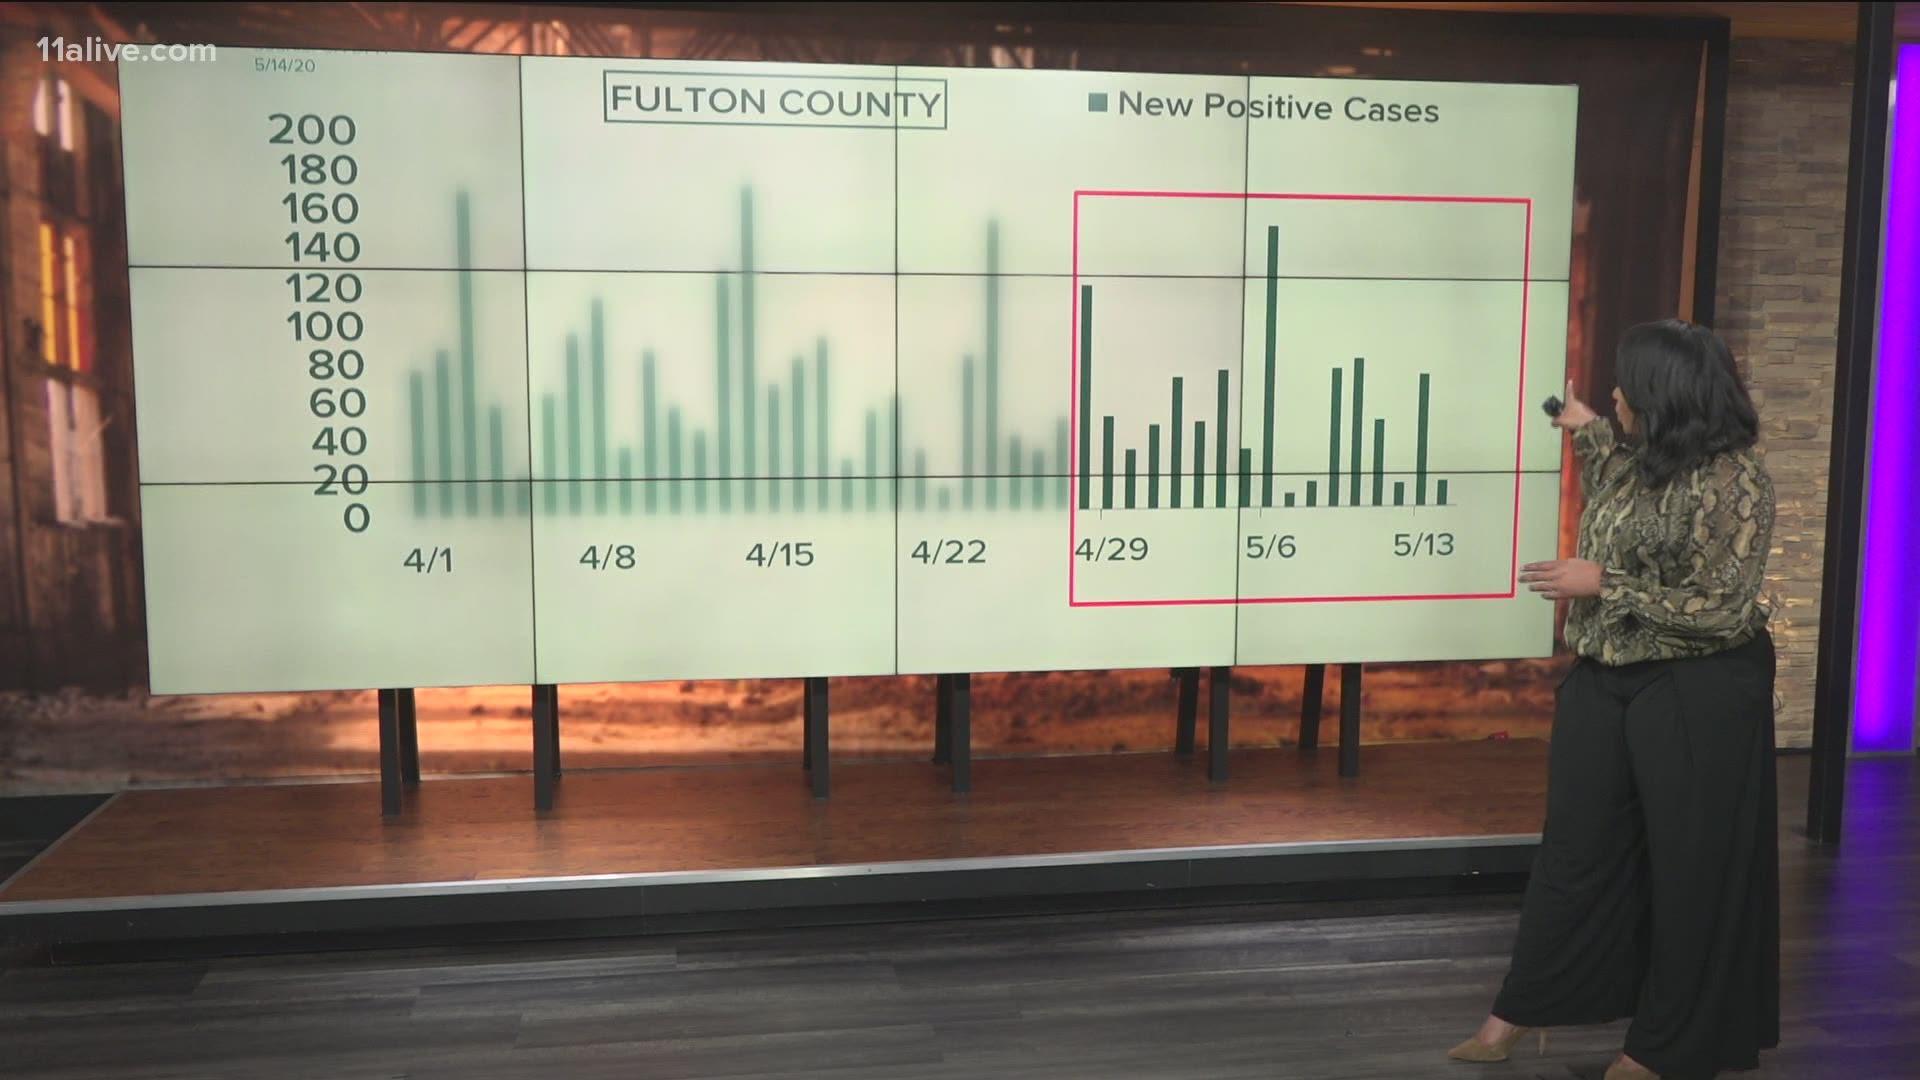 Real Time Coronavirus Updates In Georgia On May 14 11alive Com